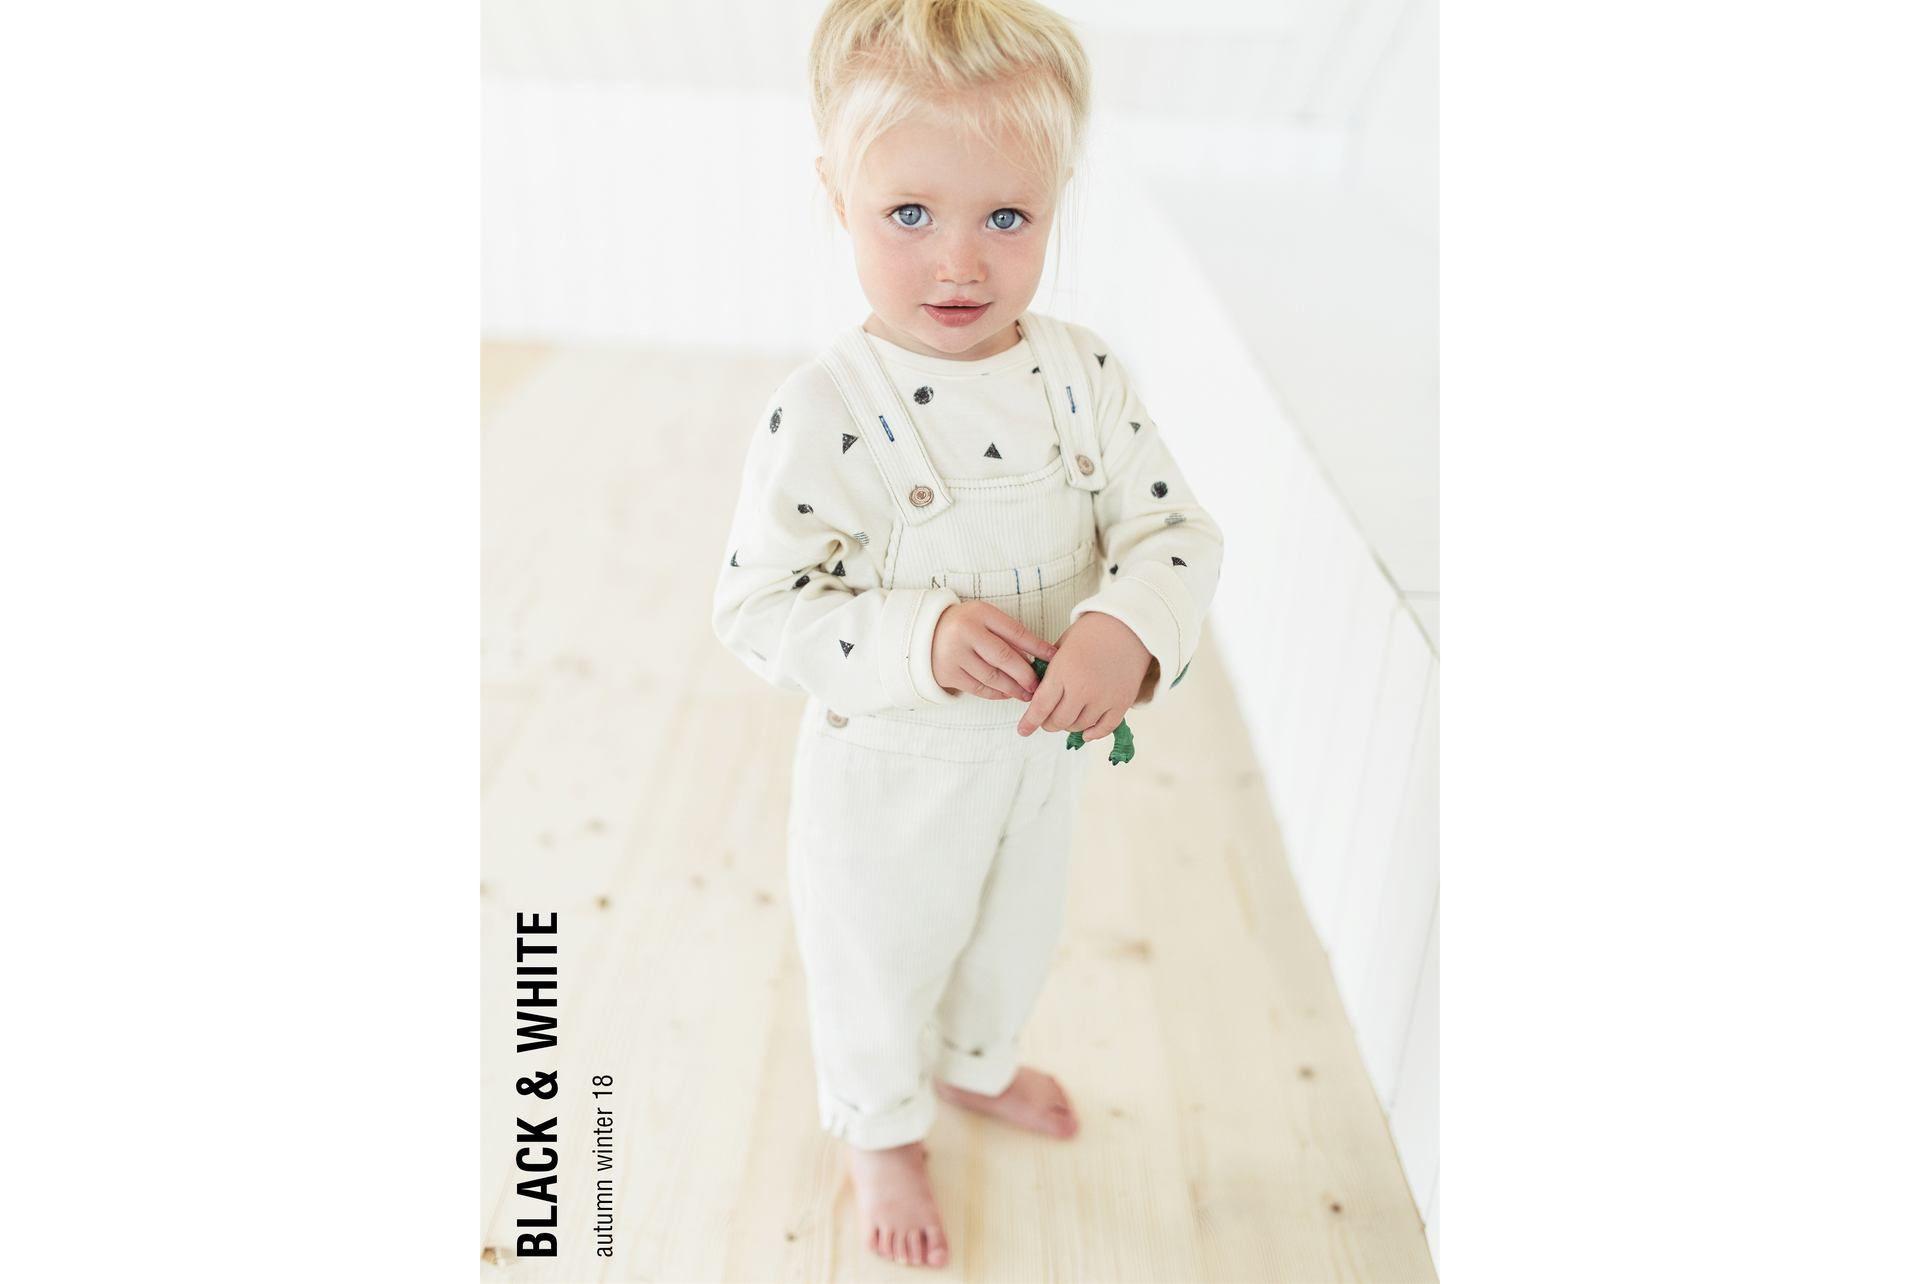 Black white shop by collection baby meisje maanden jaar